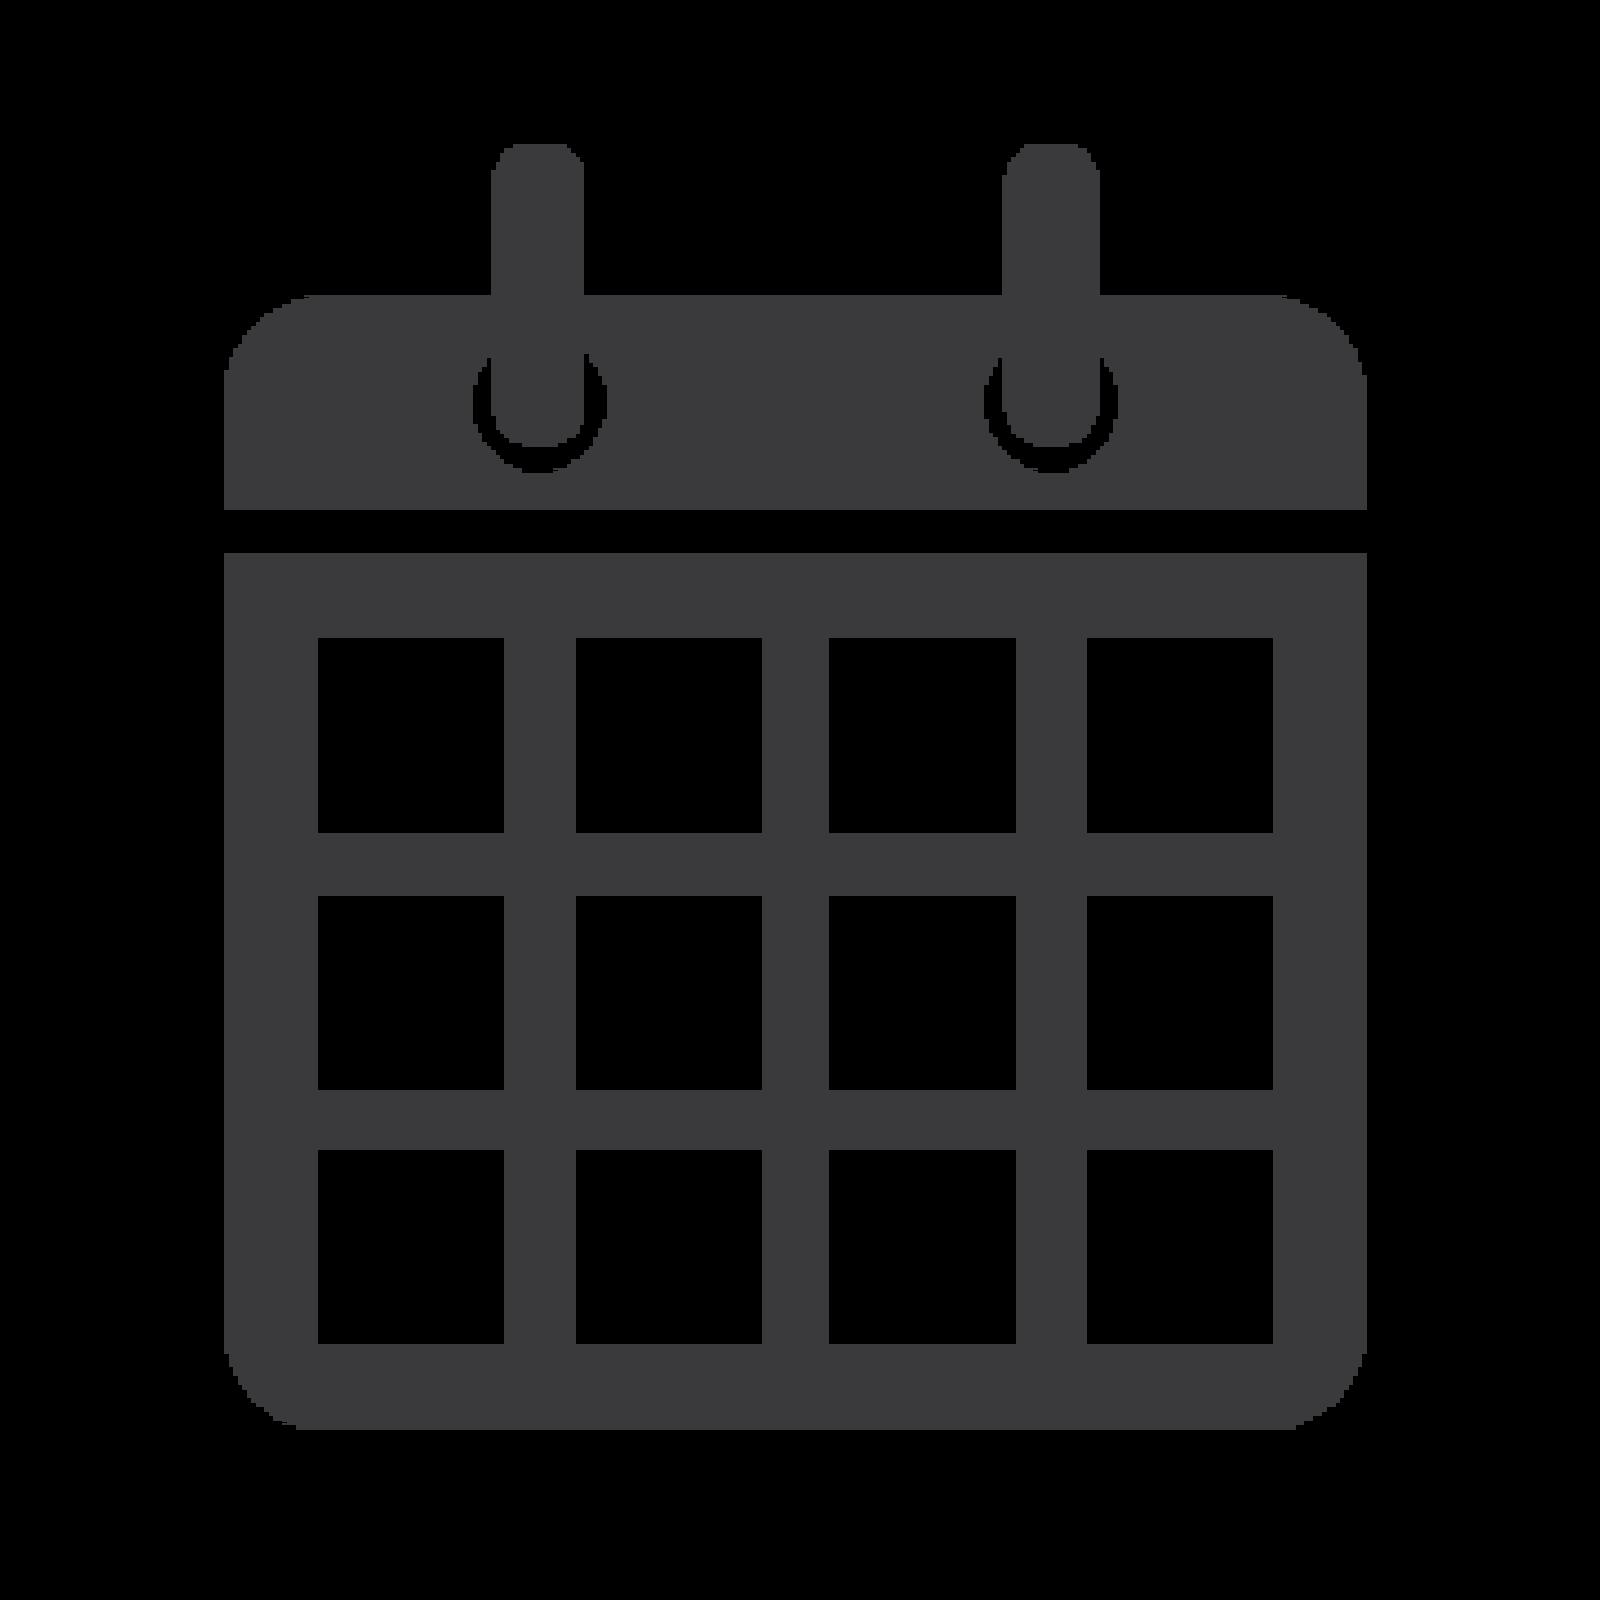 Calendar Background Designs Png : Calendar icon marketing image echocommunity